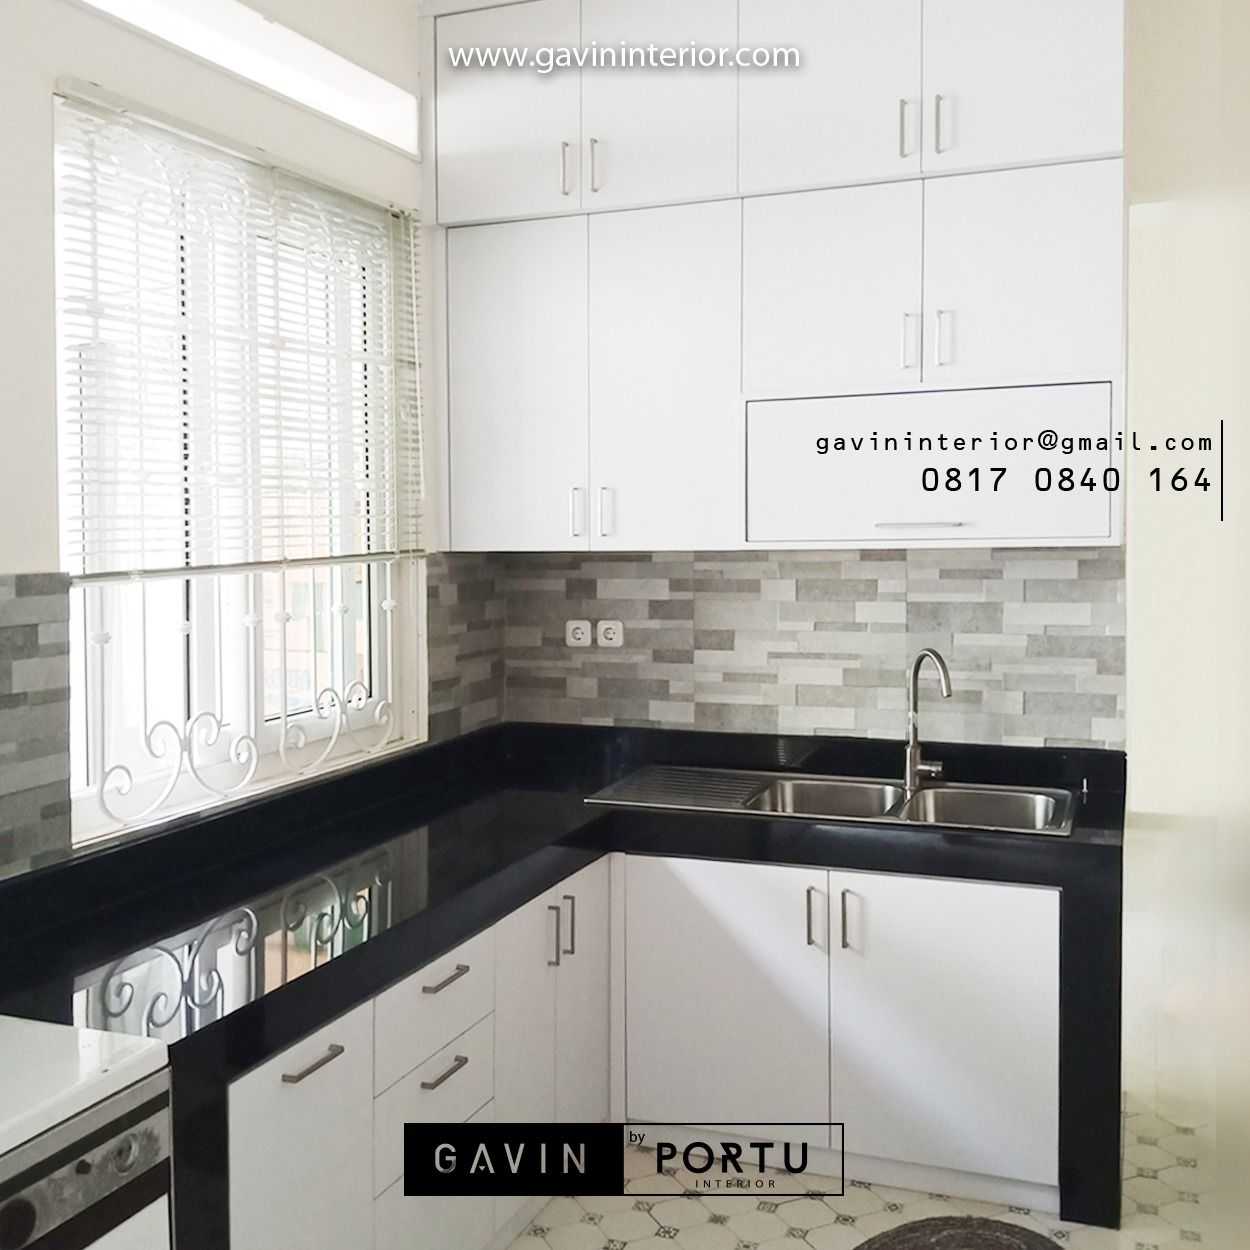 Review tentang kitchen set letter l minimalis modern terbaru finishing hpl putih dengan granit hitam